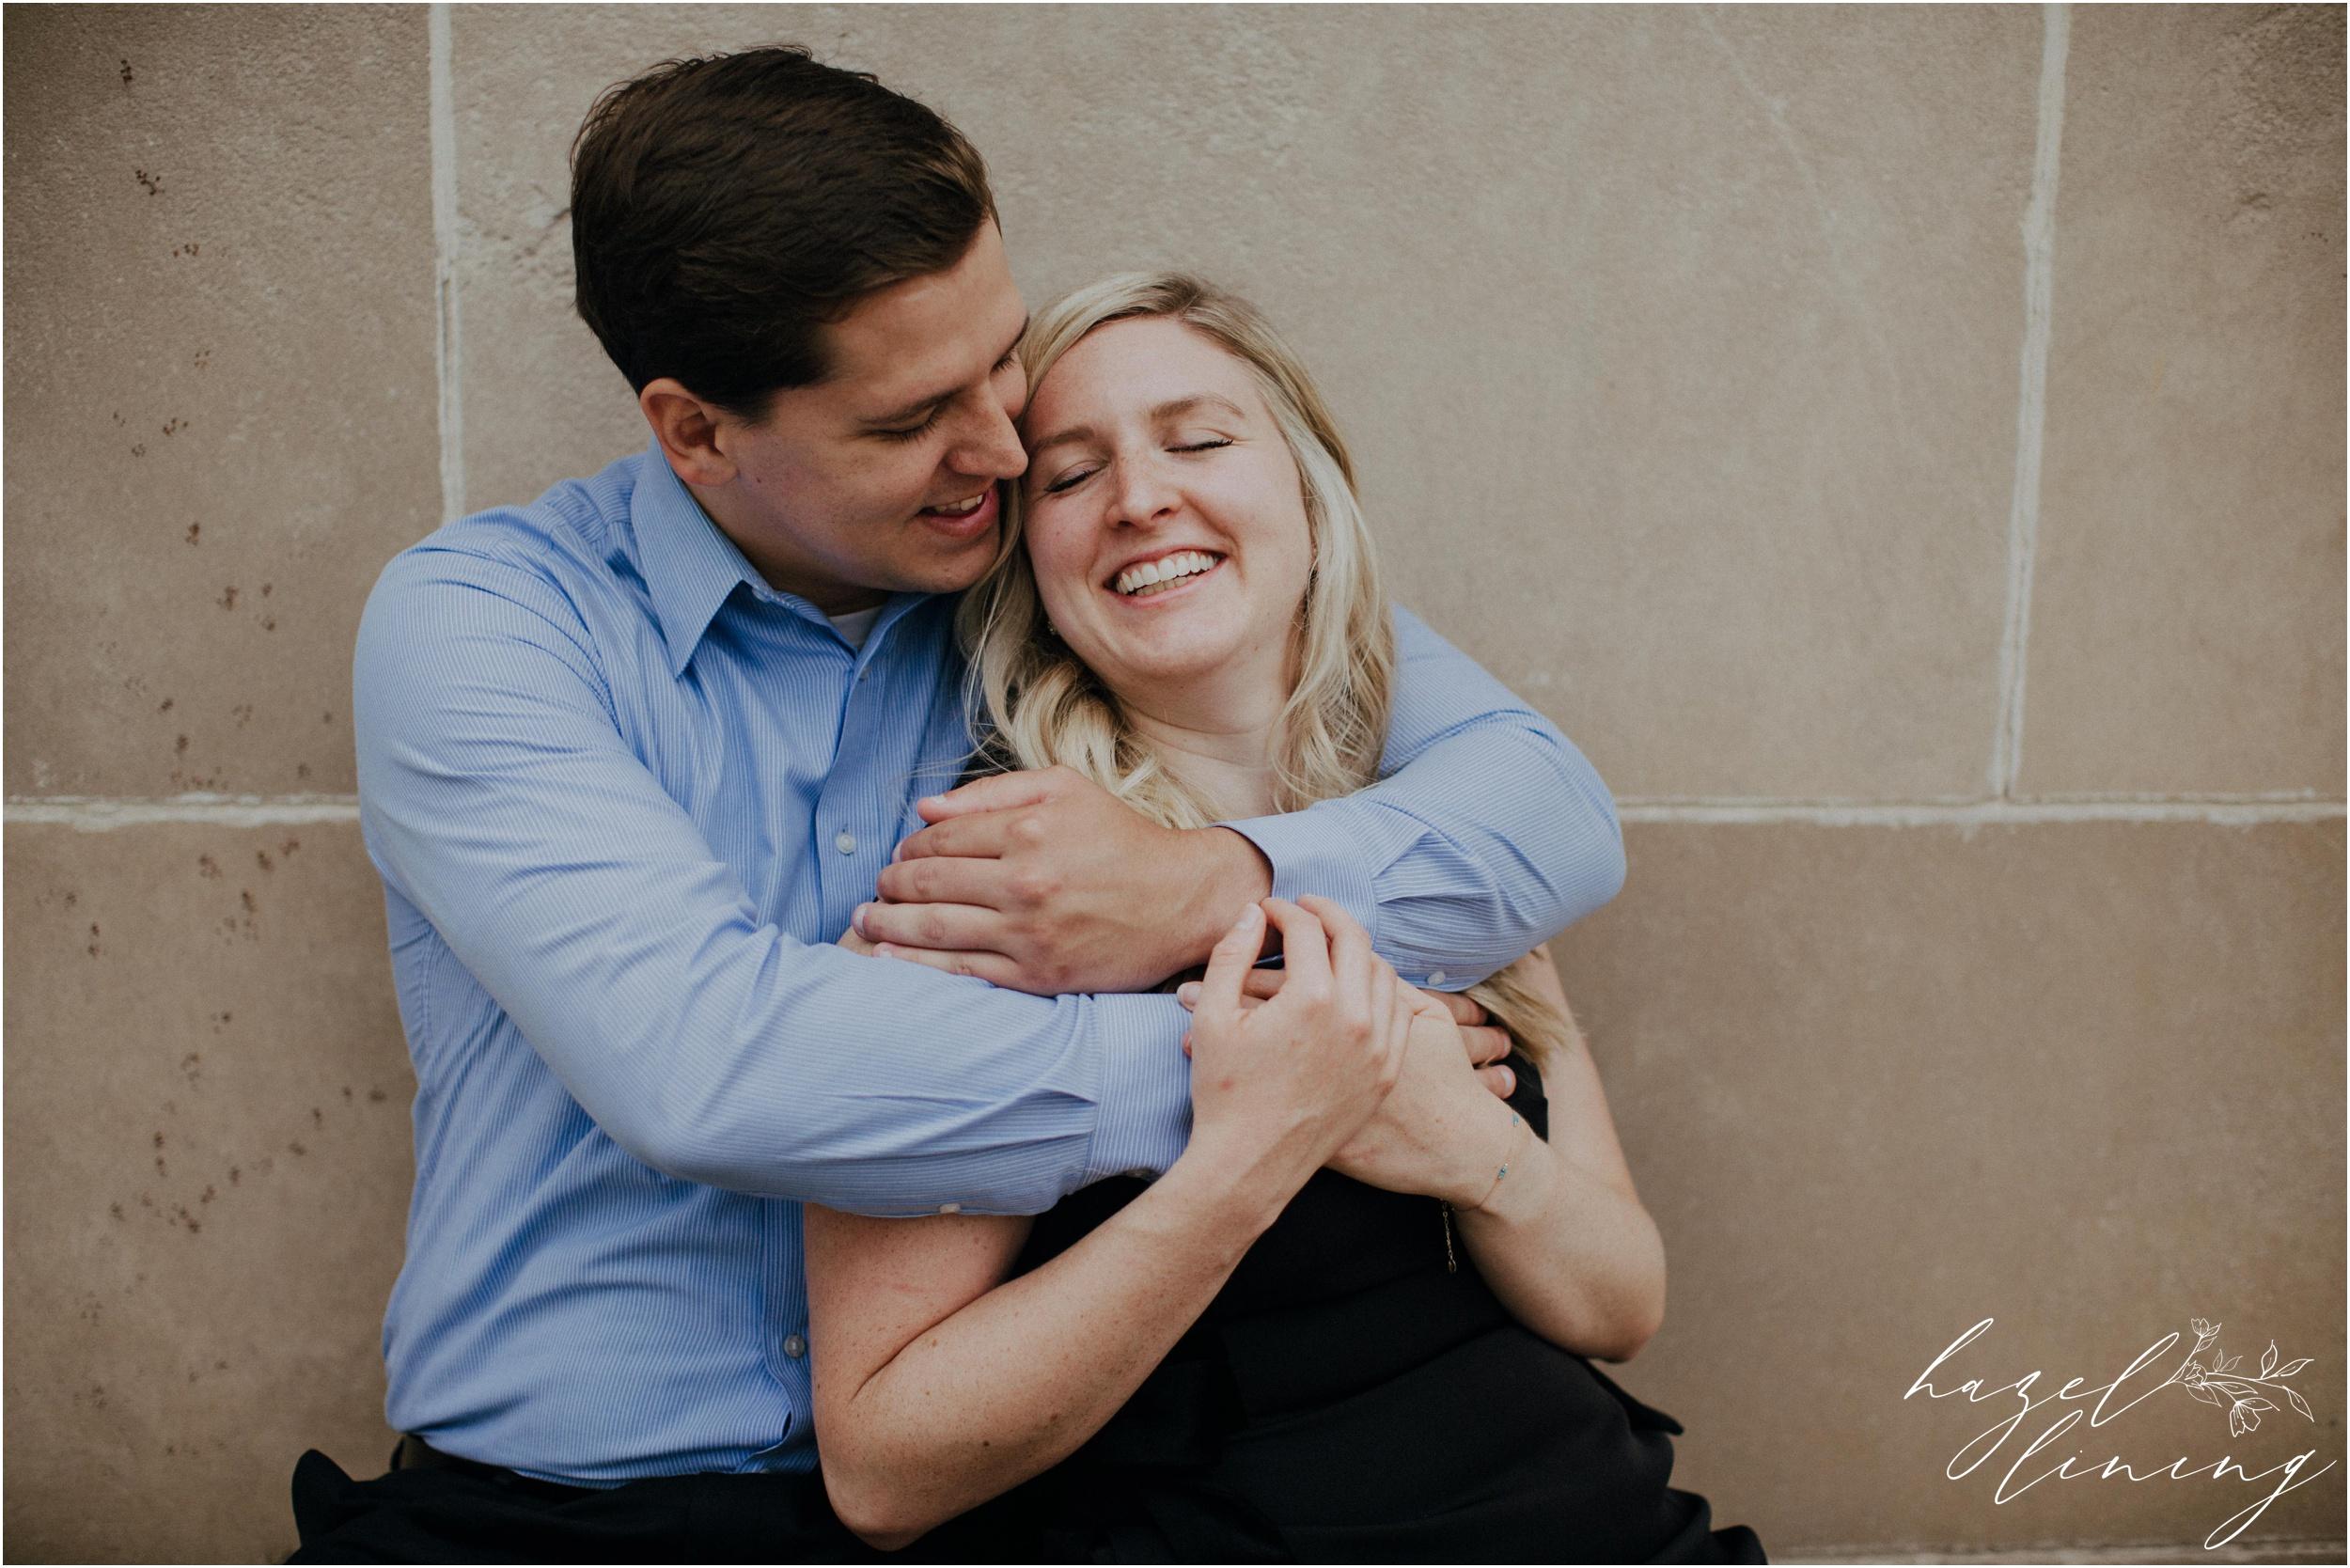 victoria-travis-logan-mayes-longwood-gardens-kennett-square-philadelphia-engagement-session-hazel-lining-photography-destination-elopement-wedding-engagement-photography_0025.jpg